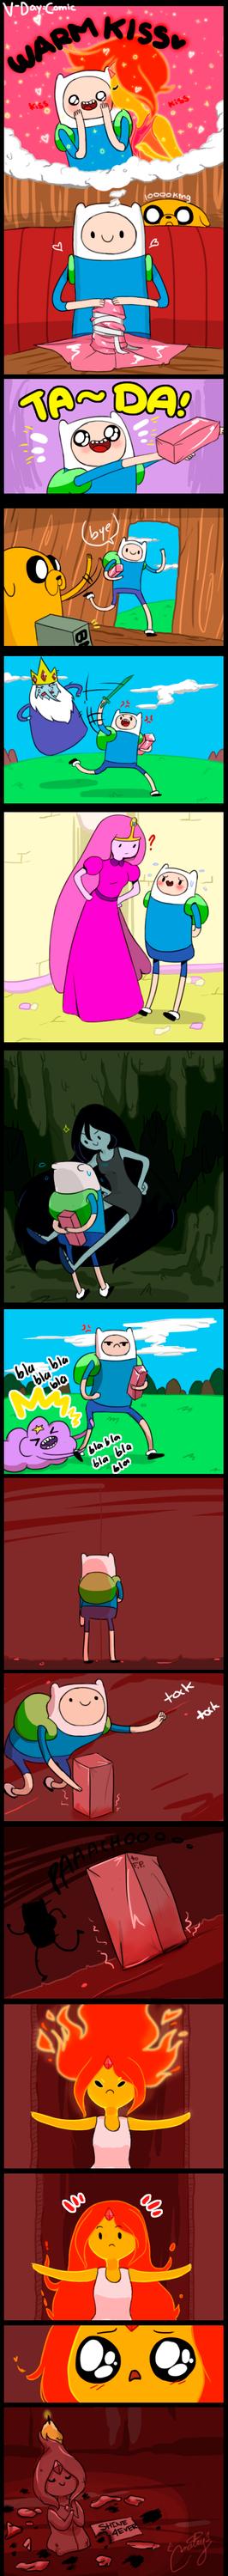 MiniComic: Finn x Flame Princess V-Day by malengil